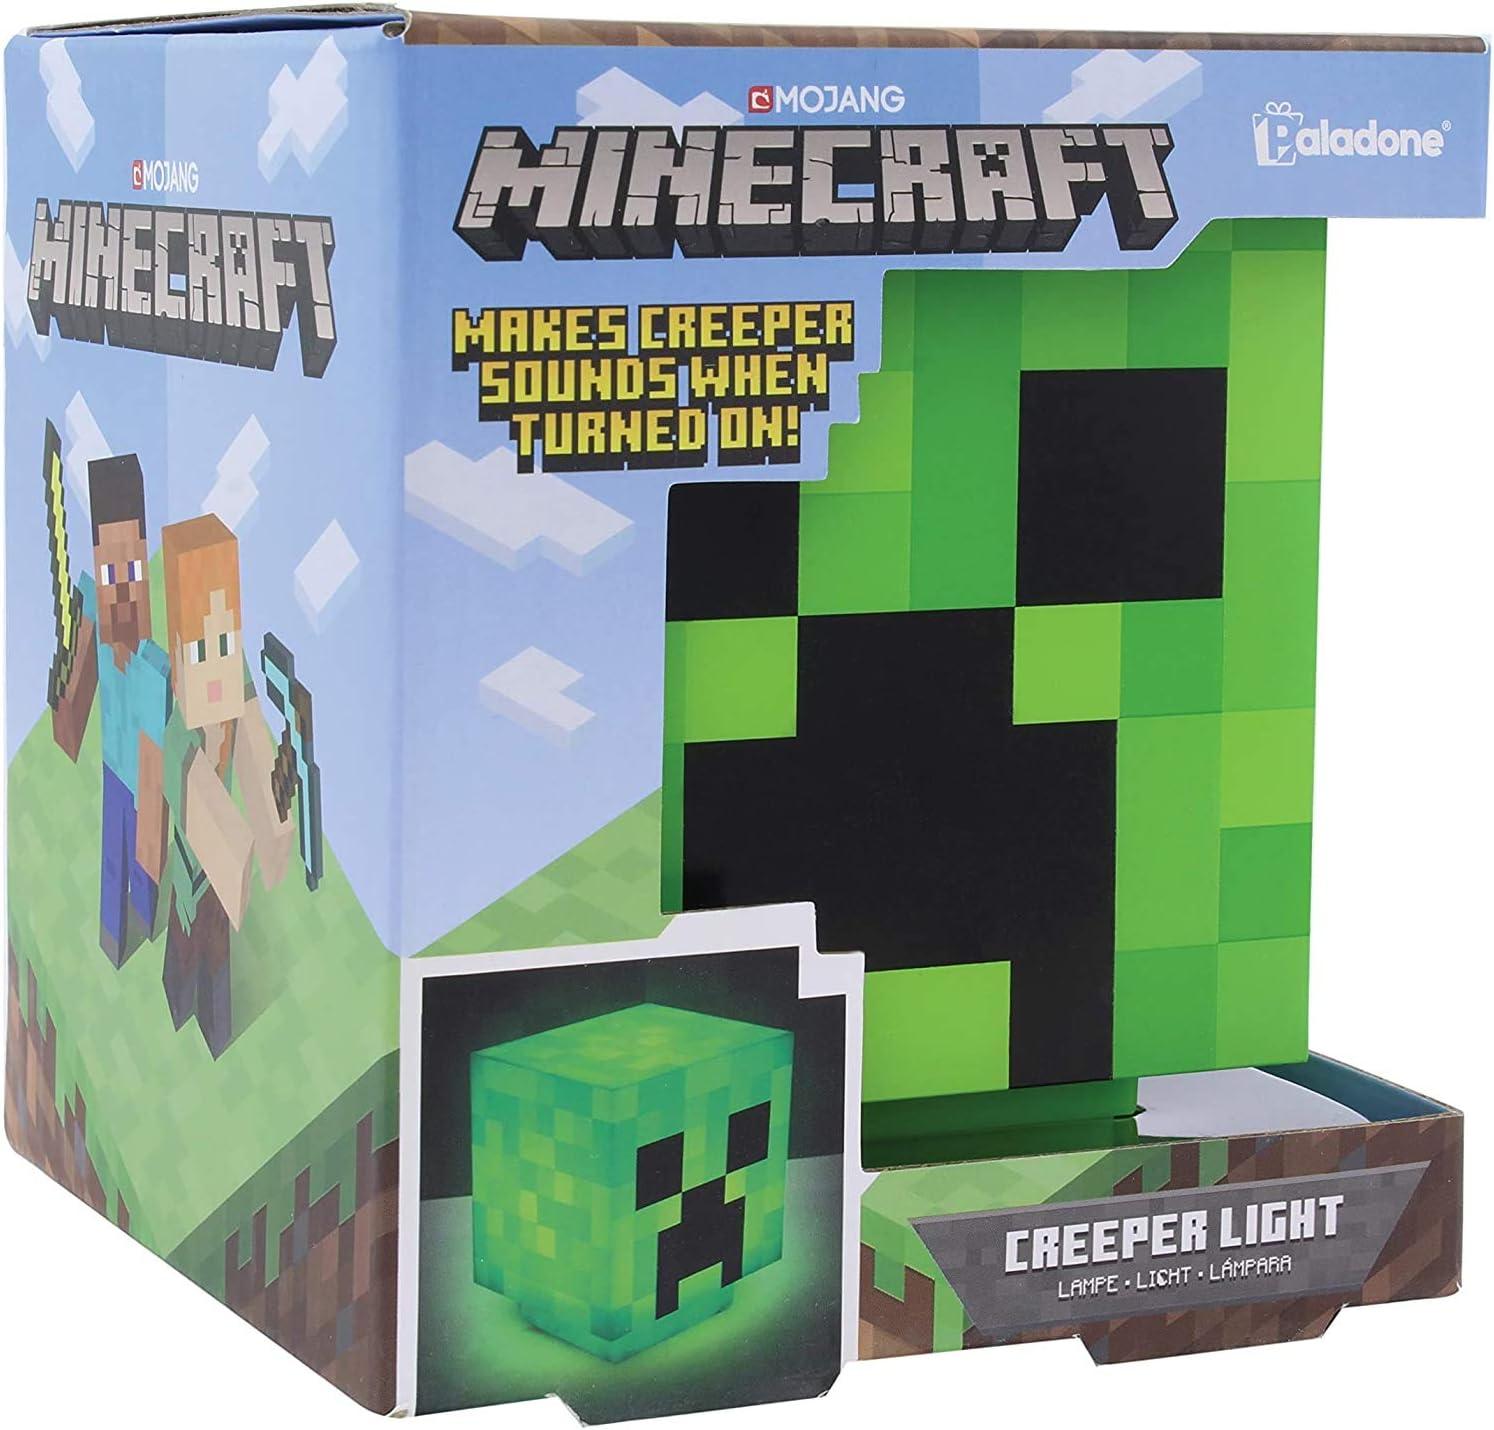 Minecraft Creeper Light: Computer and Video Games - Amazon.ca